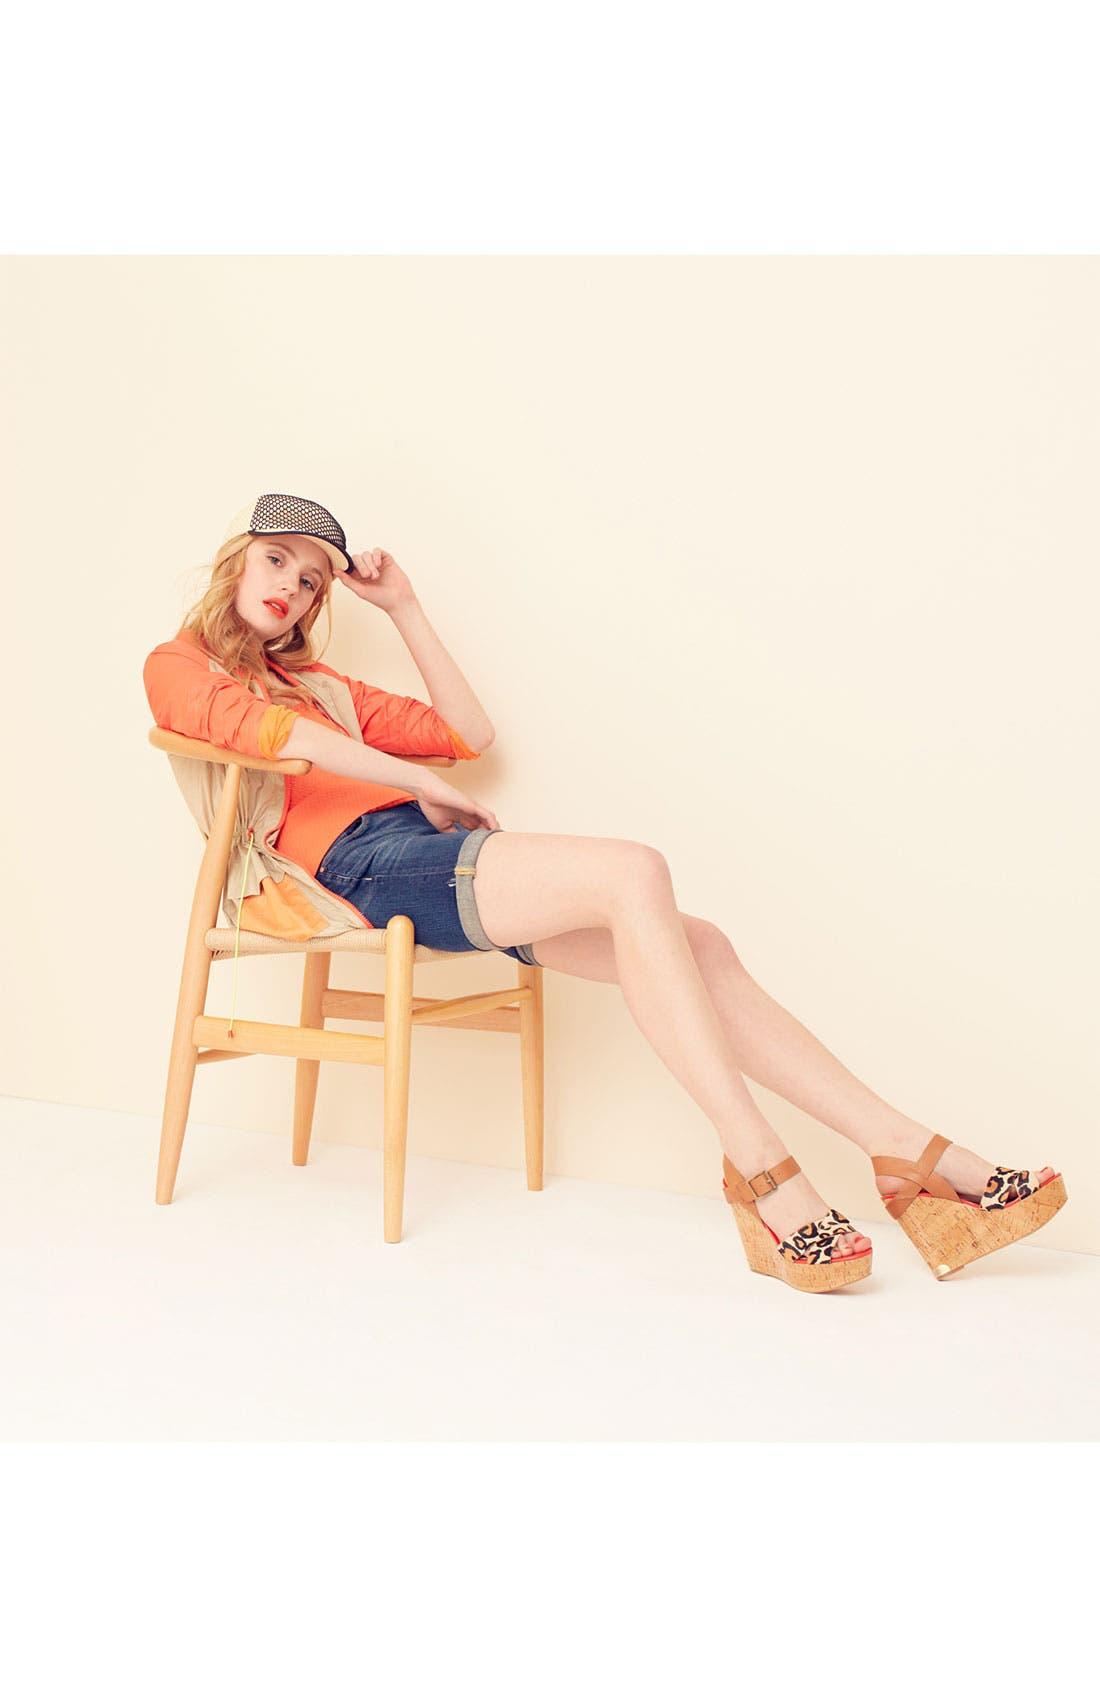 Alternate Image 1 Selected - Sam Edelman Colorblock Utility Jacket & Wedge Sandal